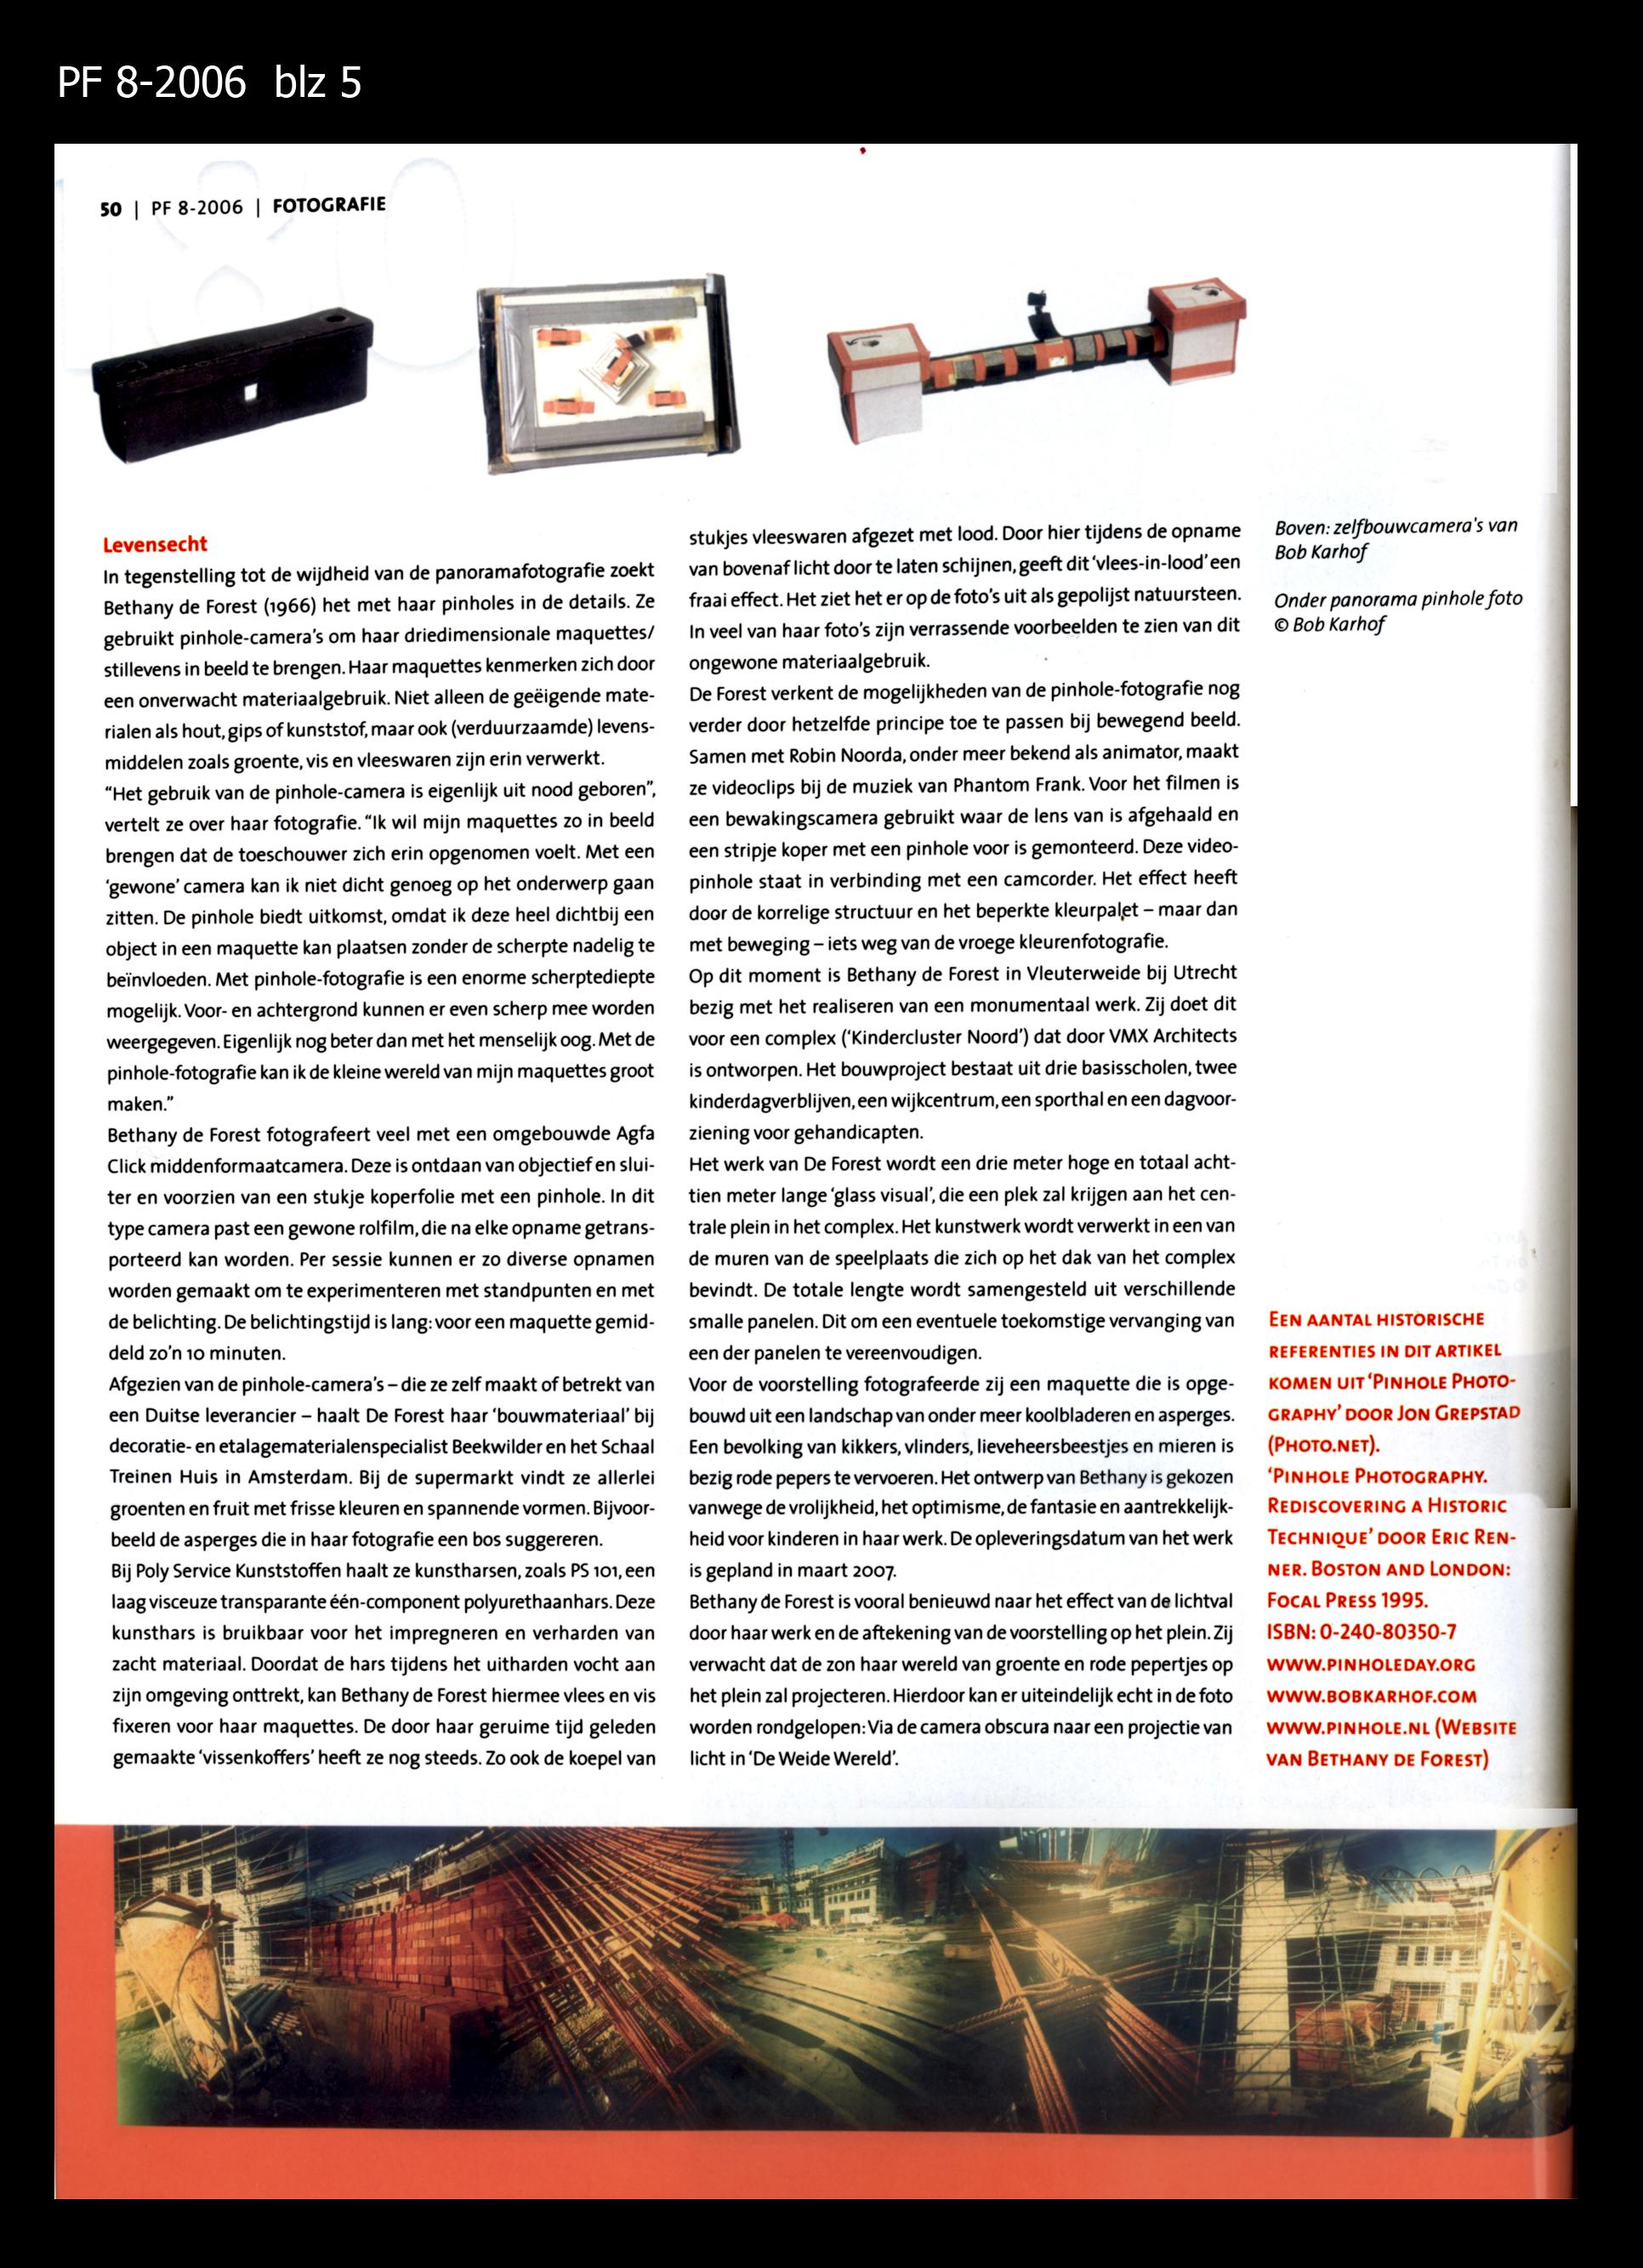 pf blz 5.jpg